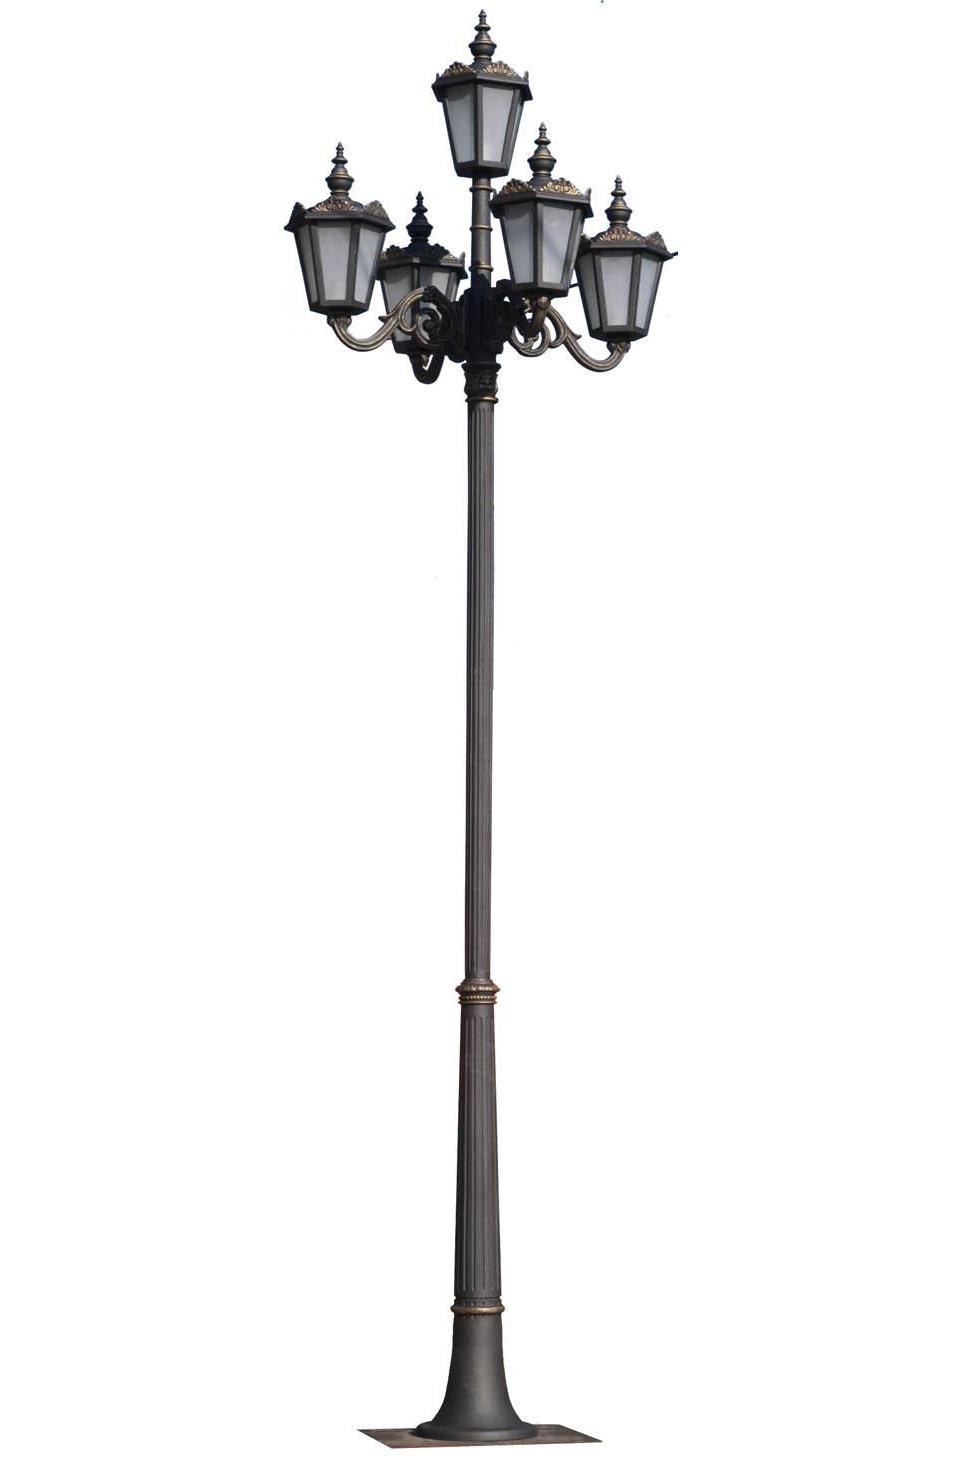 Stalpi ornamentali pentru iluminat stradal, parcuri, gradini BRAMAL LIGHT - Poza 24